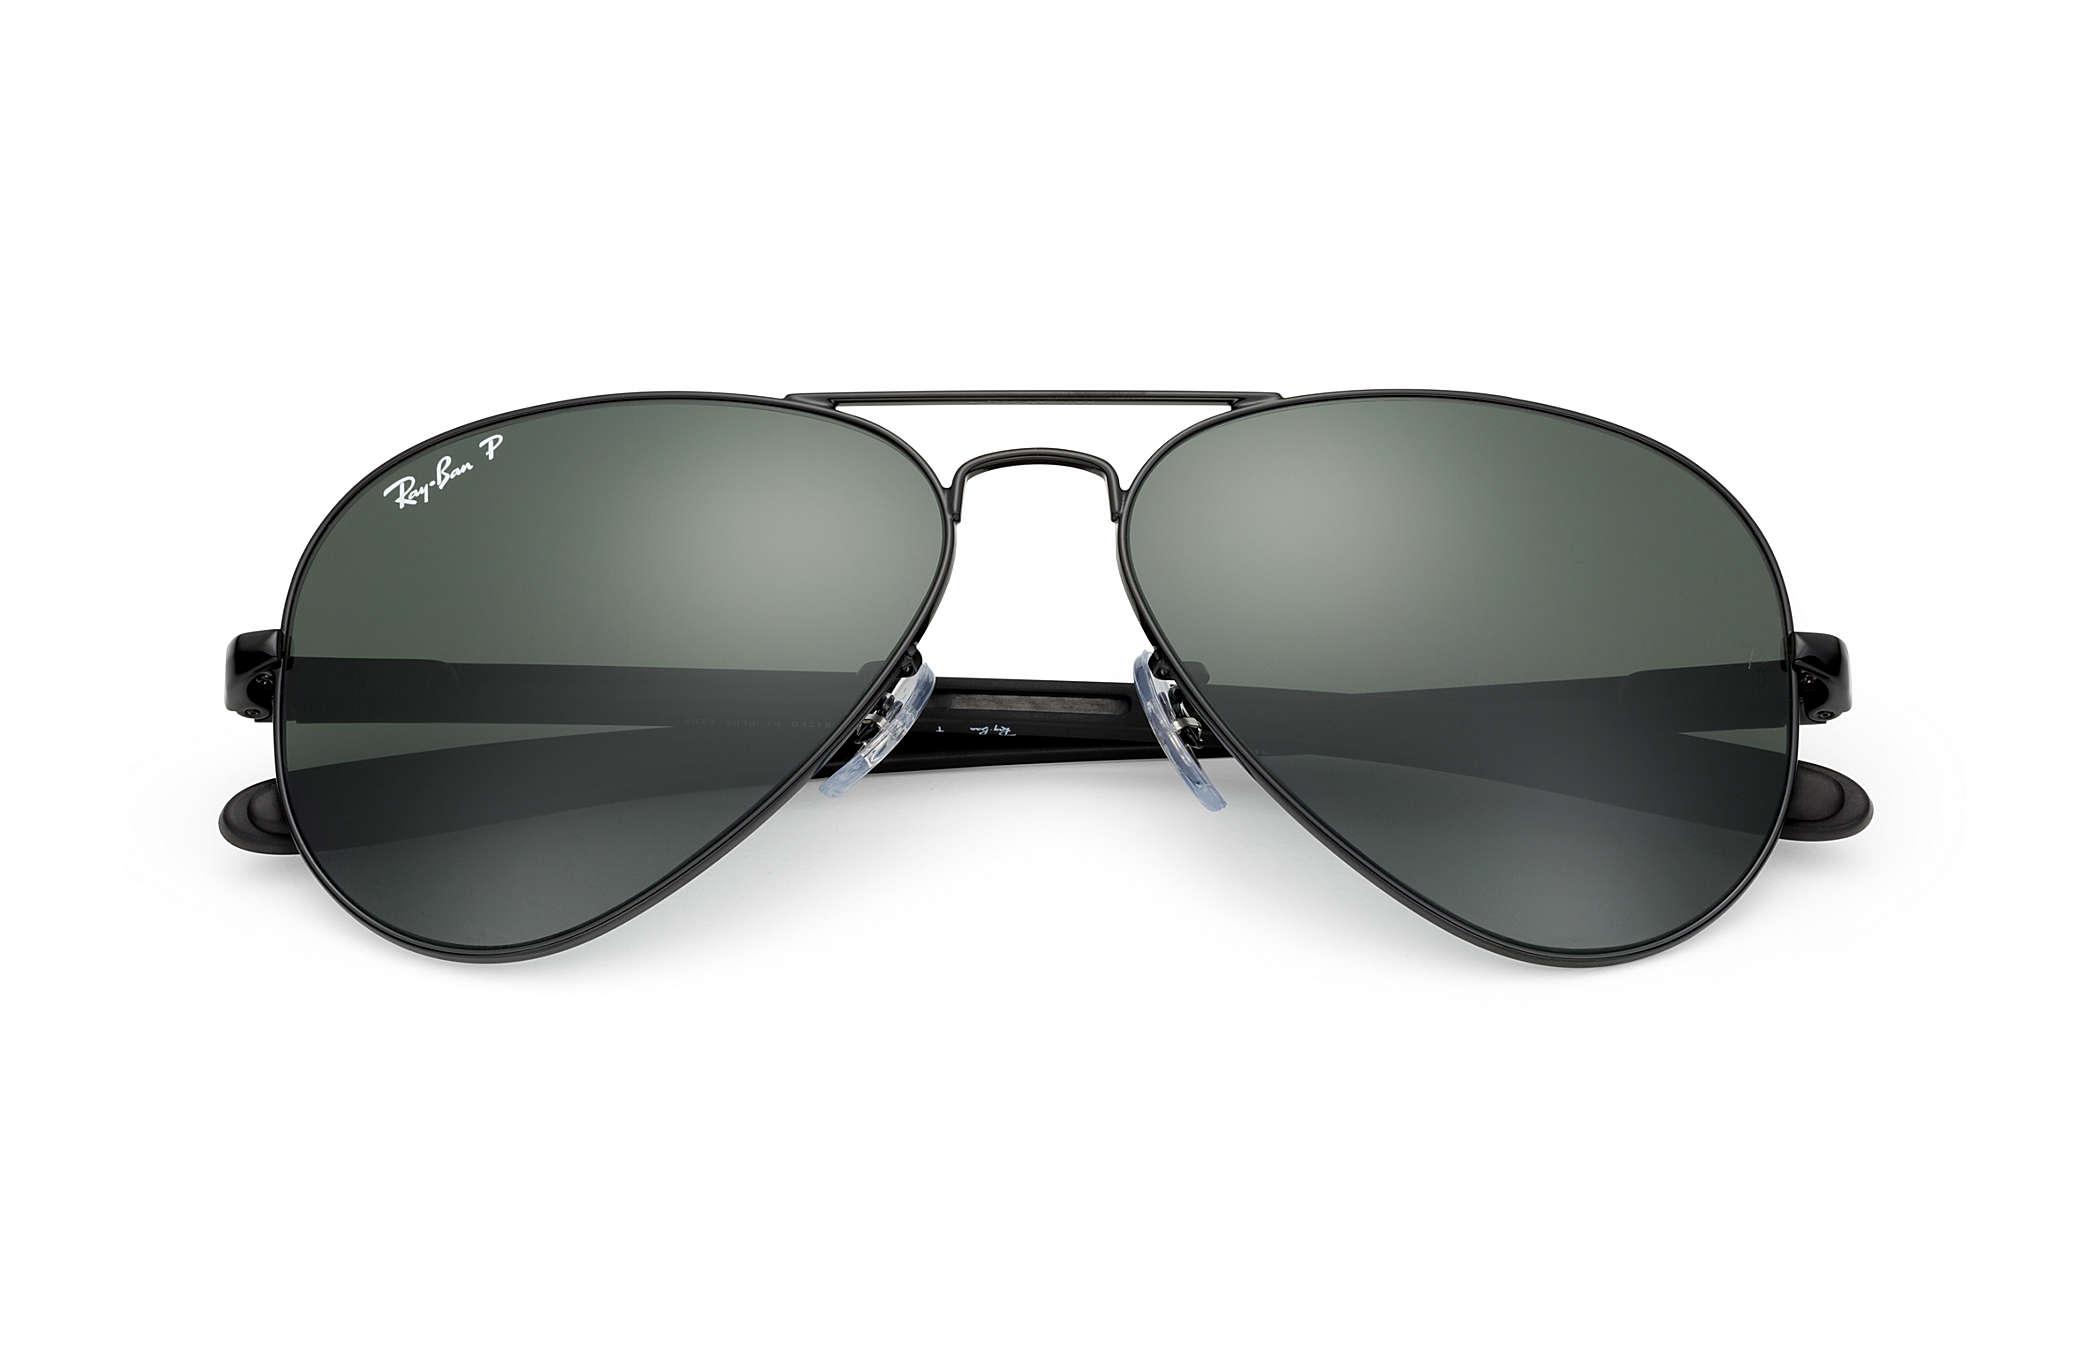 1eaf13e641 Ray-Ban Aviator Carbon Fibre RB8307 Black - Carbon Fibre - Green ...